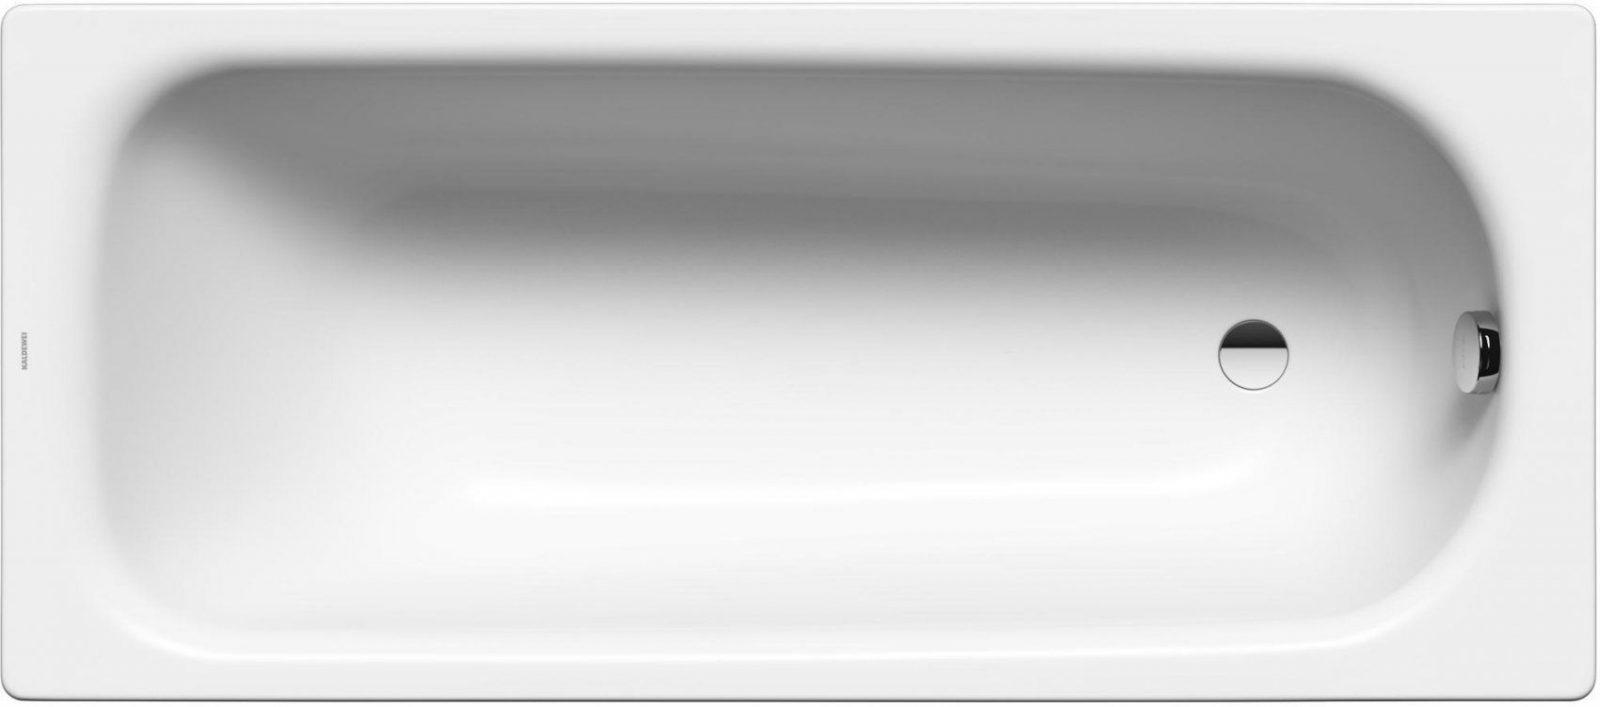 Kaldewei Advantage Saniform Plus 3731 Badewanne 170 X 75 Cm Von von Kaldewei Saniform Plus 373 1 Badewanne 170 X 75 Cm Bild